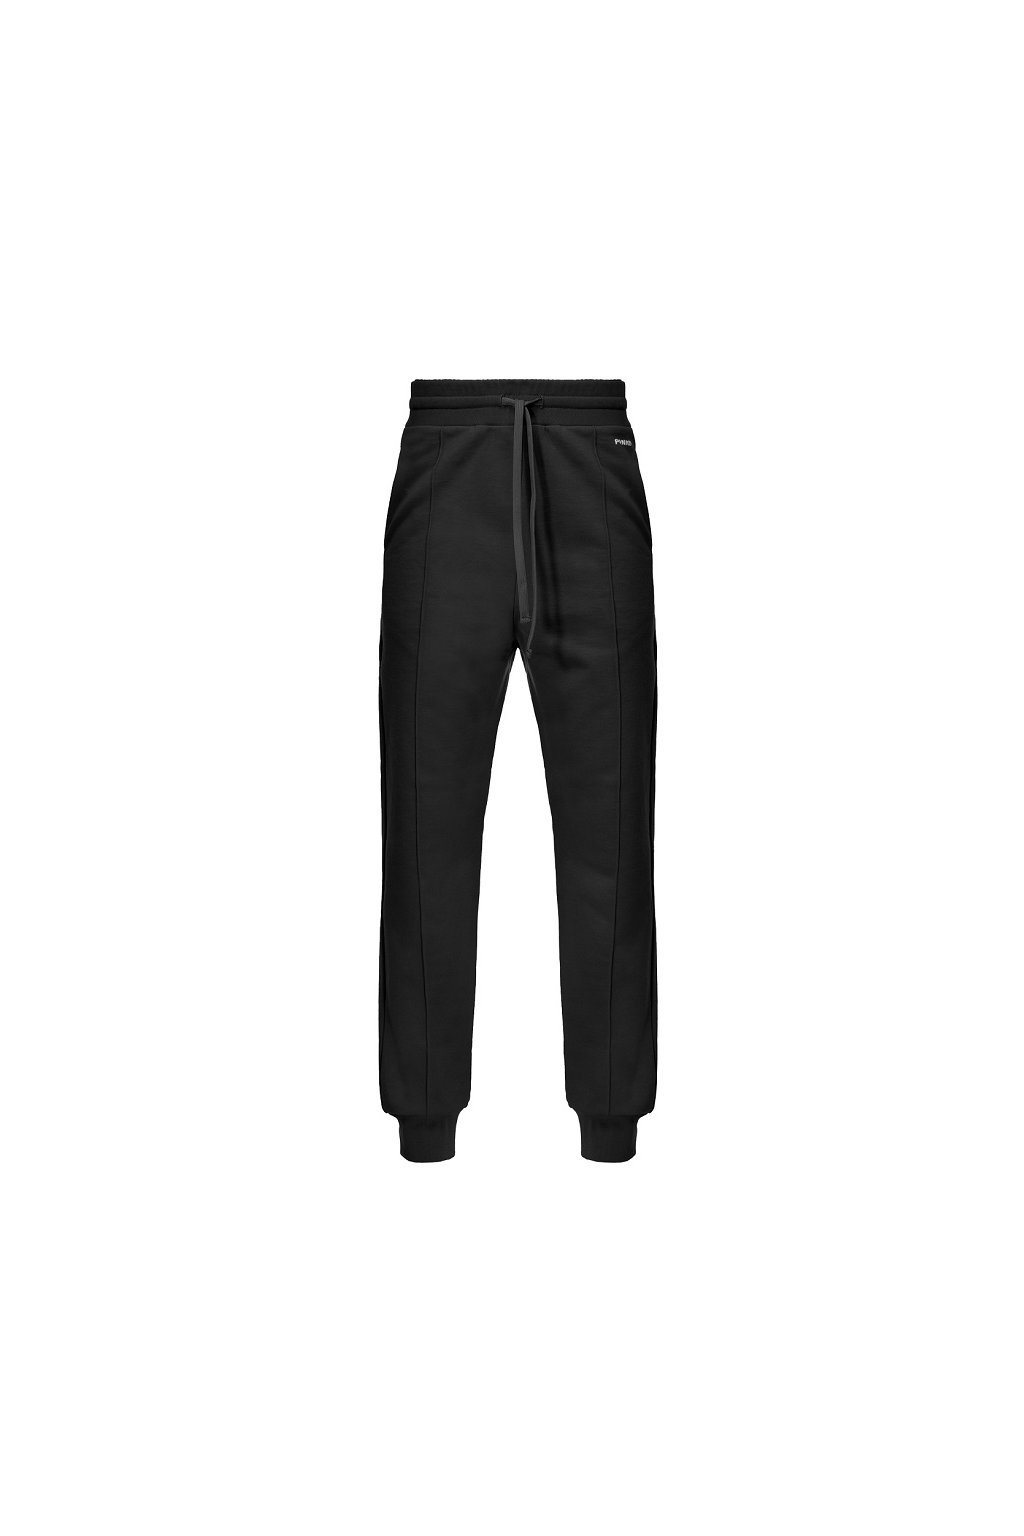 1N12Y0Y75F Z99 Dámské kalhoty Pinko Addams černé